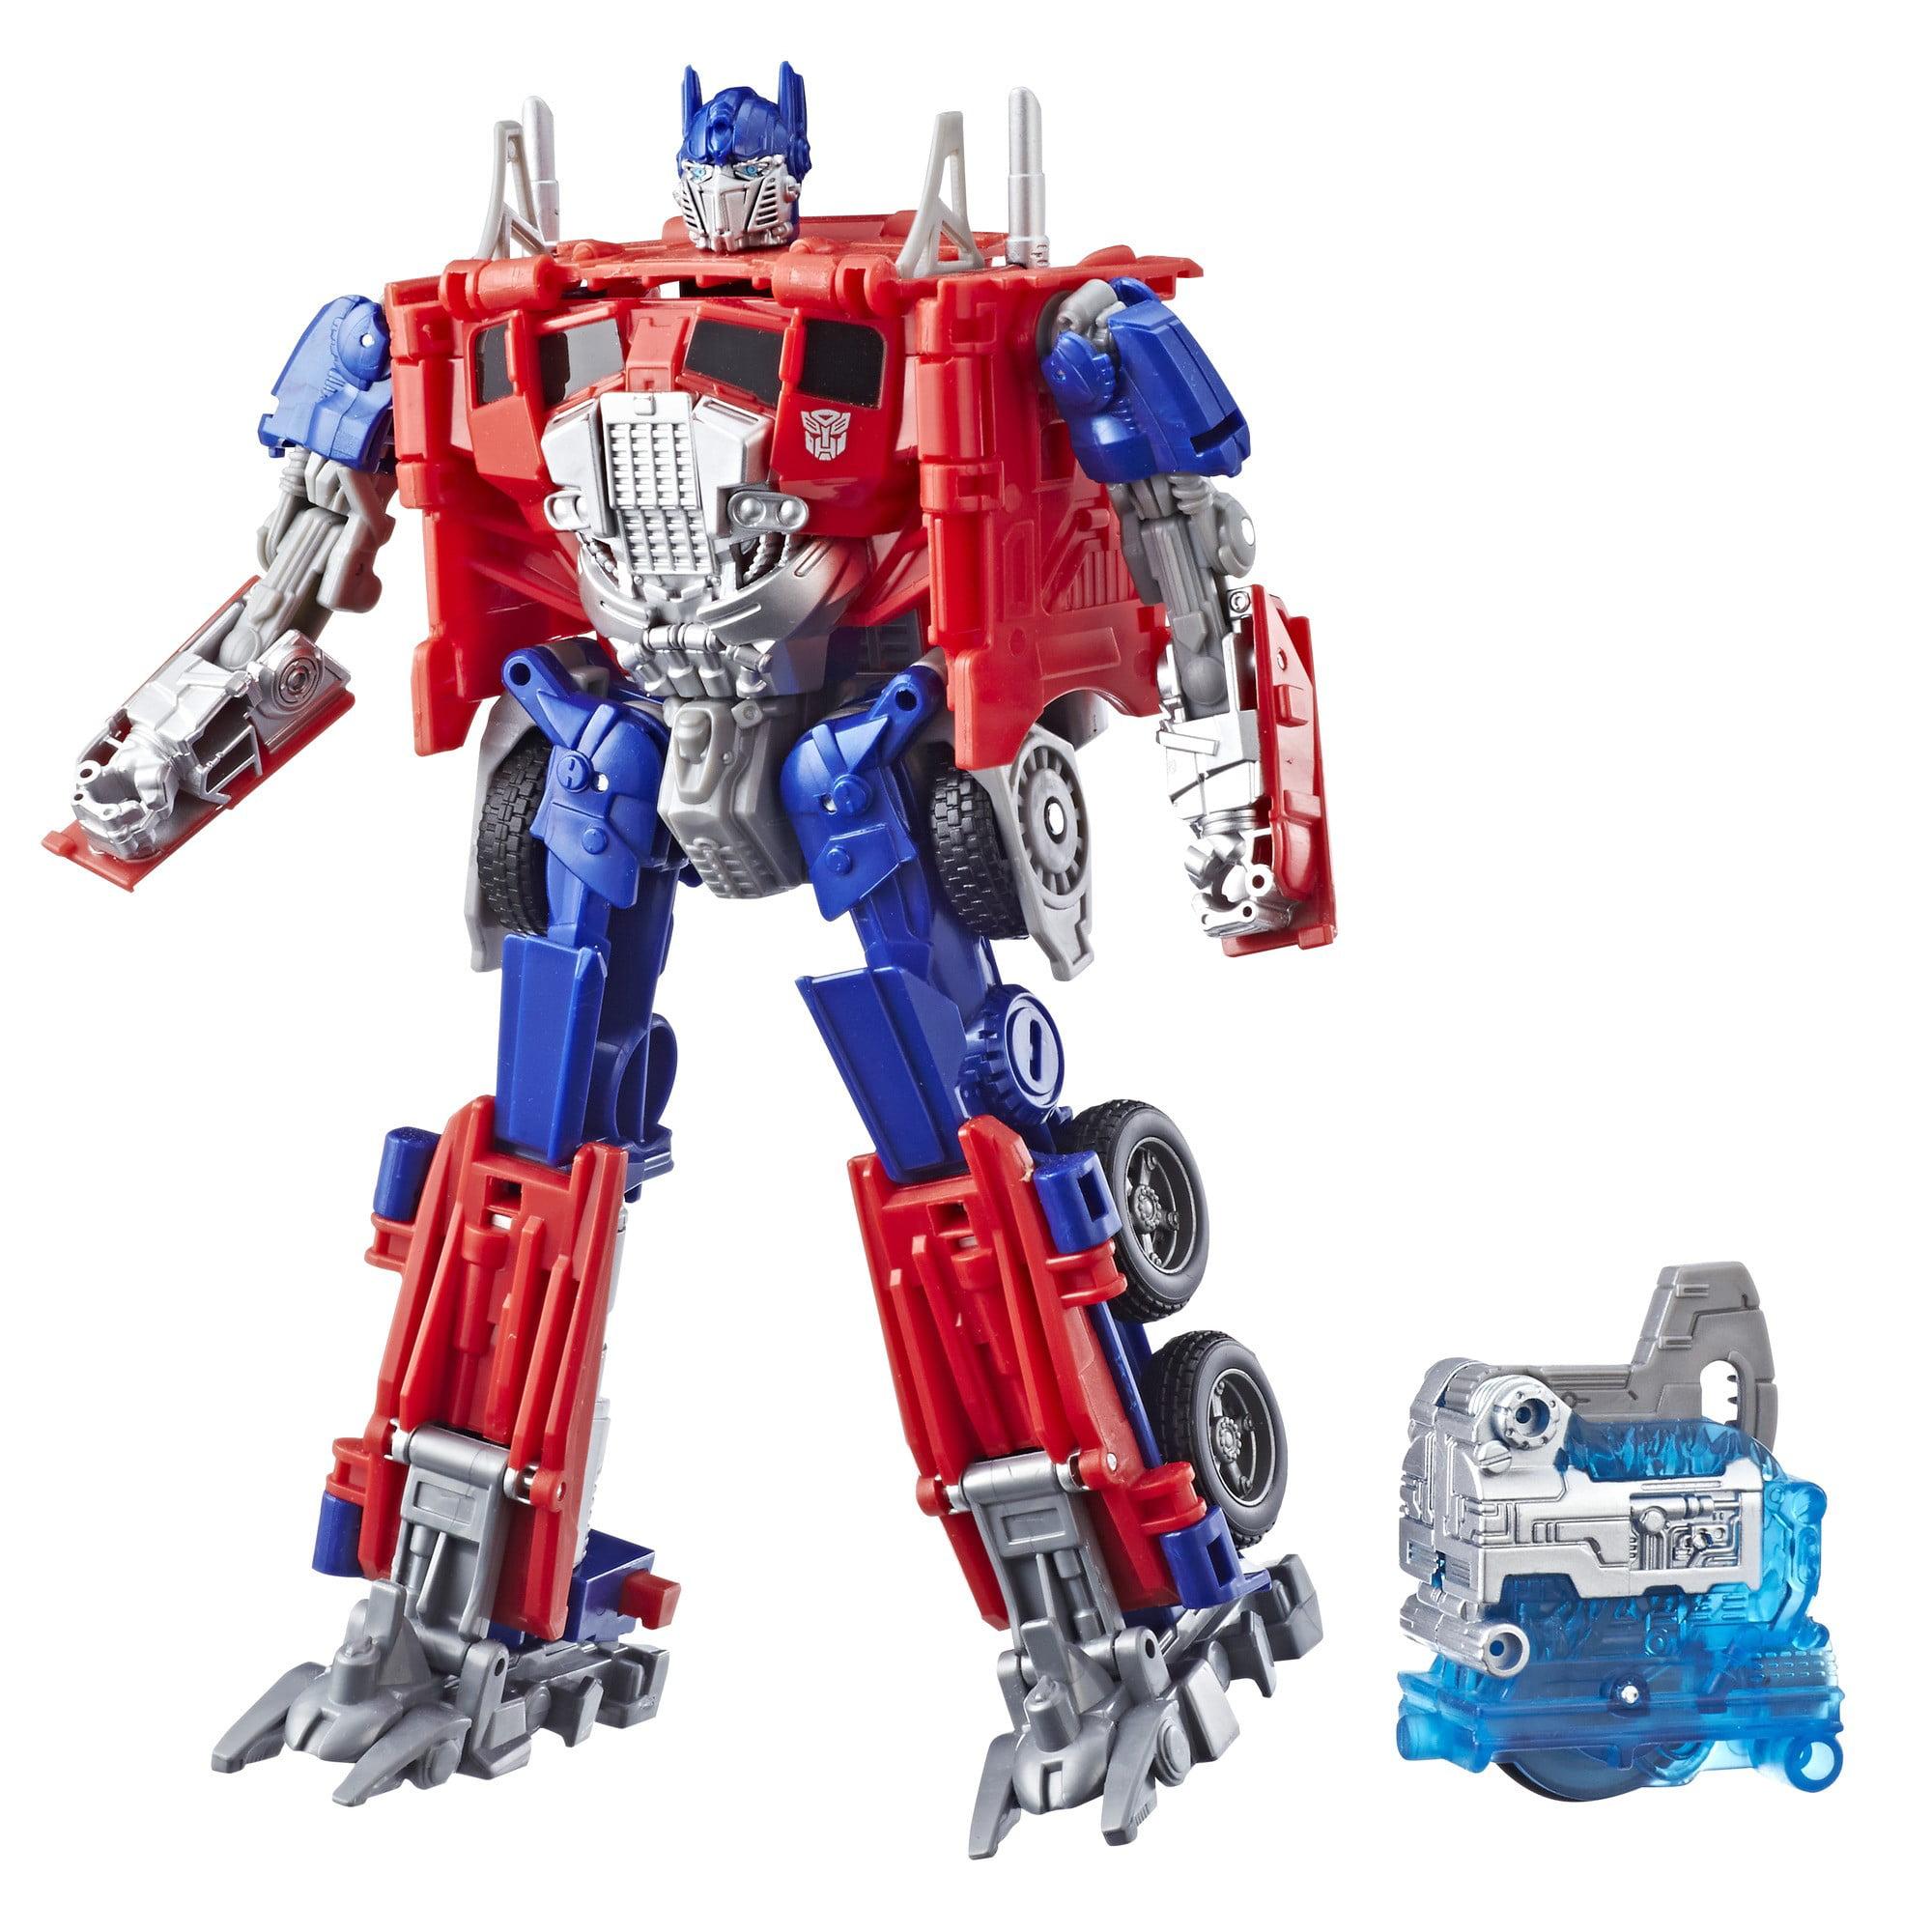 Transformers bumblebee: energon igniters nitro series optimus prime